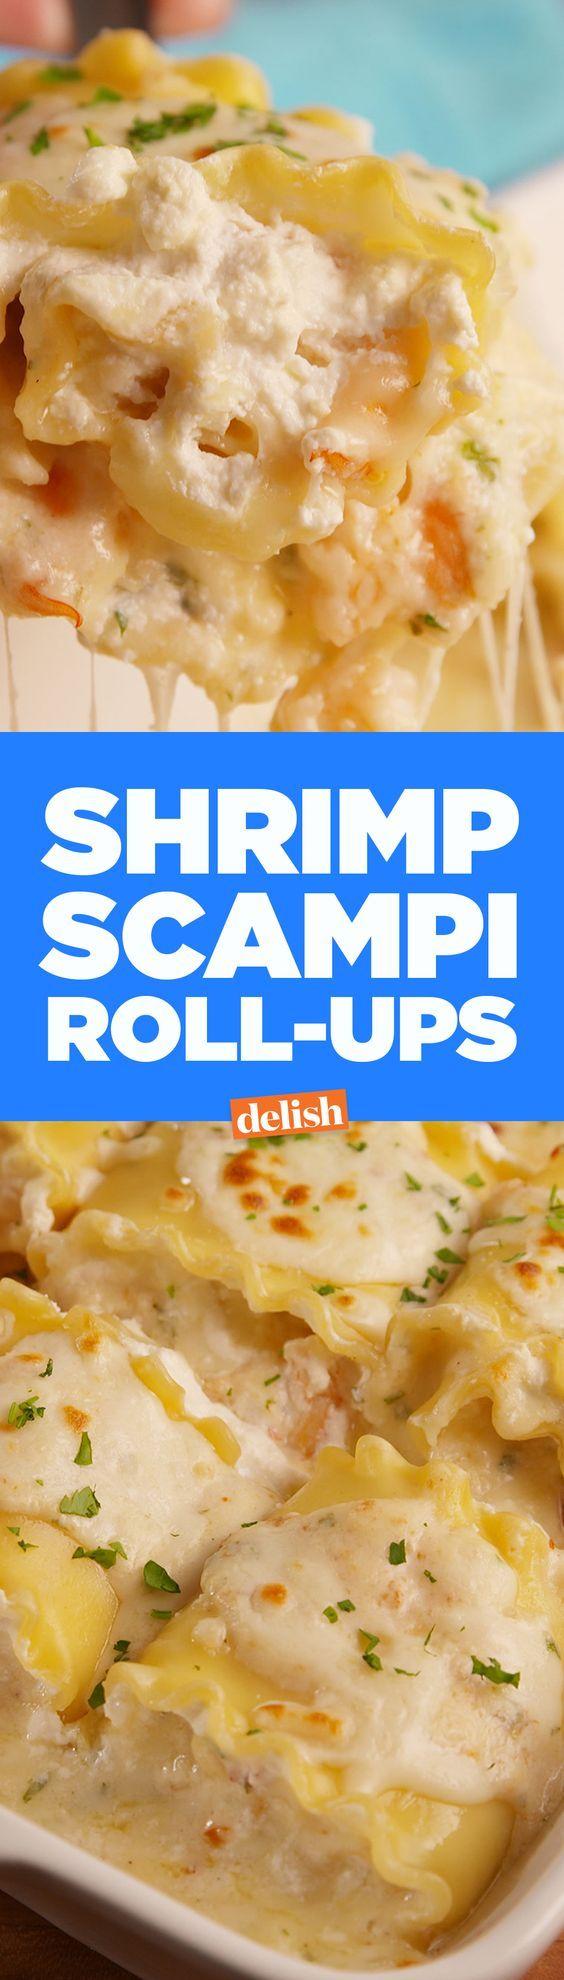 Best 25 Shrimp Scampi Oven Ideas On Pinterest Recipe For Shrimp Scampi In The Oven Oven